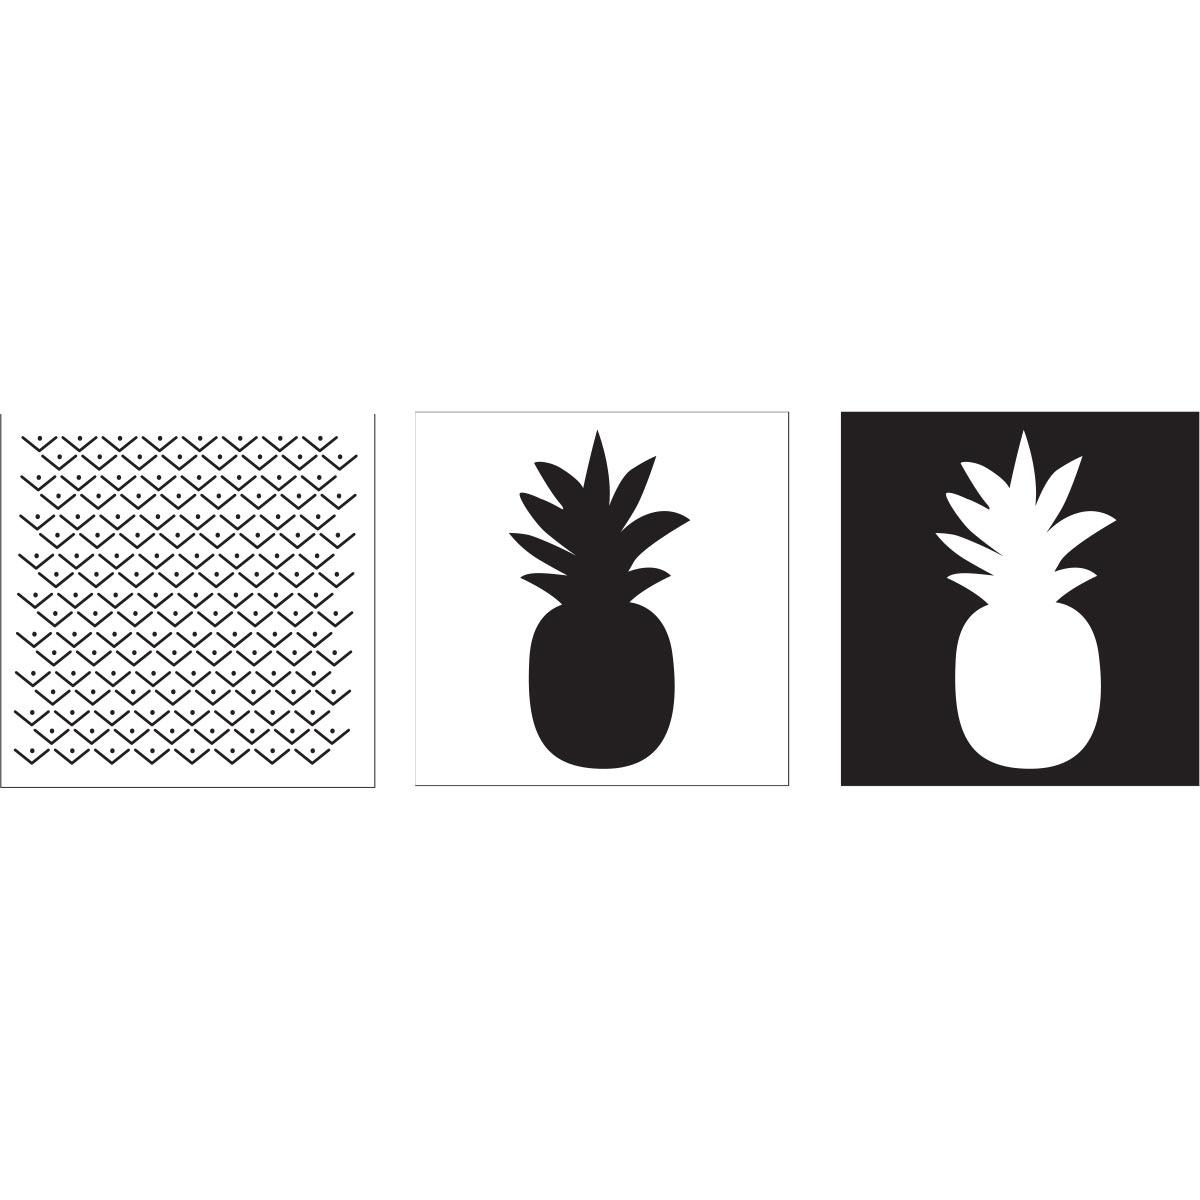 FolkArt ® Layering Stencils - Pineapple - 13232